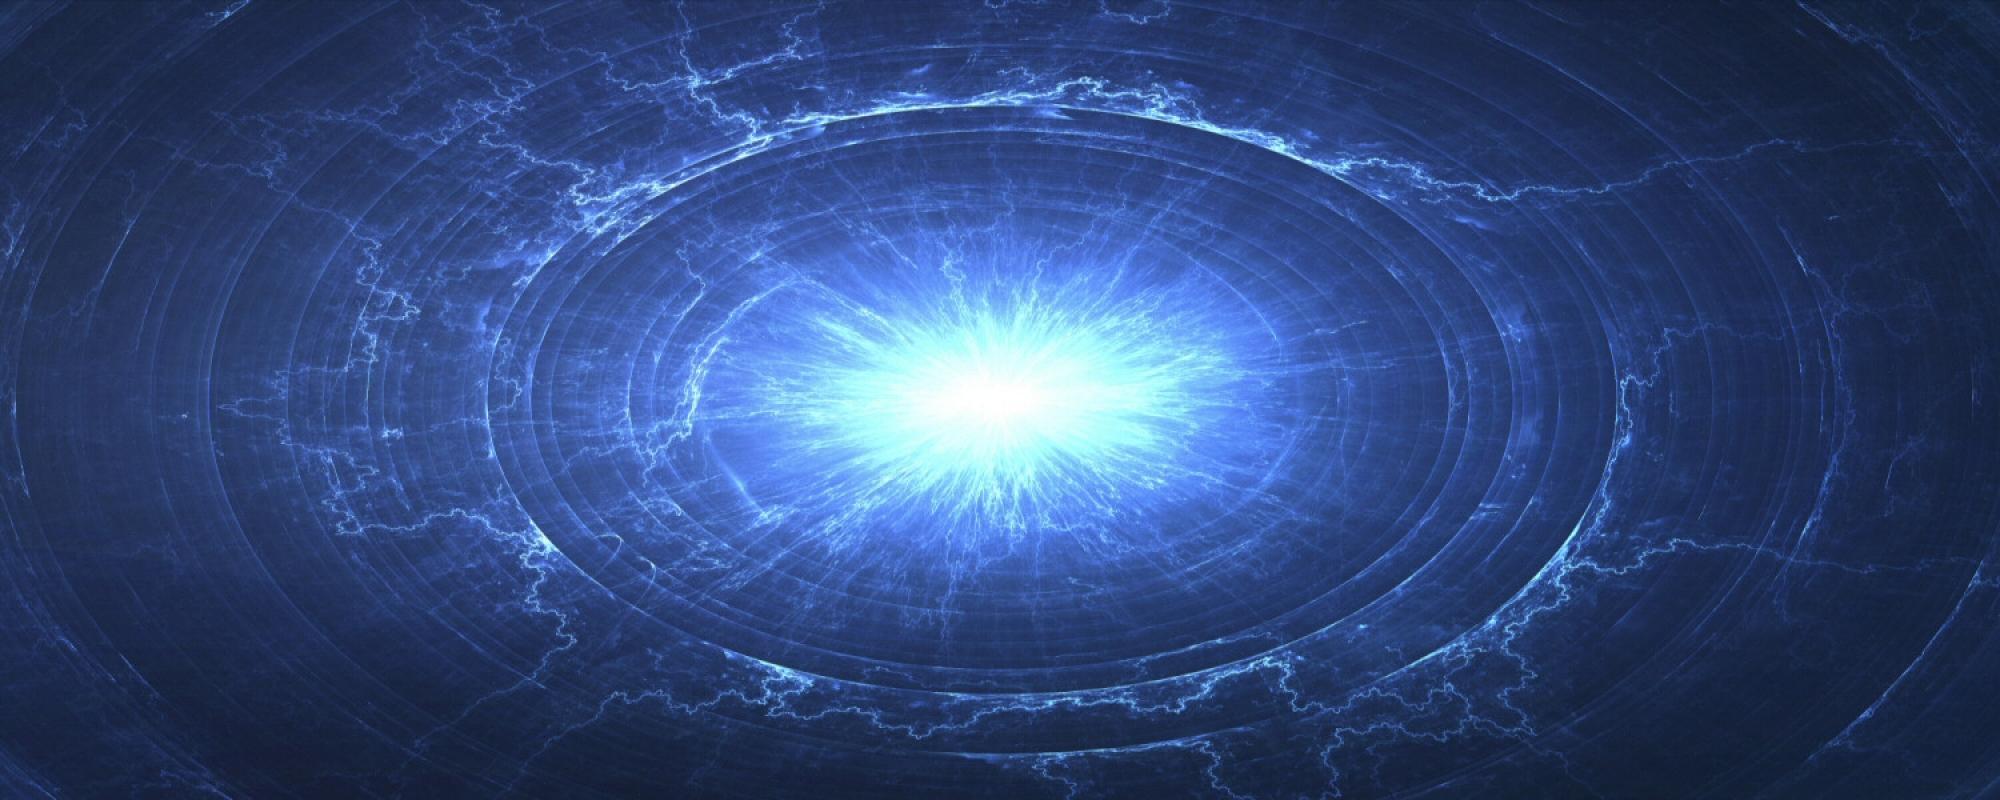 Plasma Physics Photo